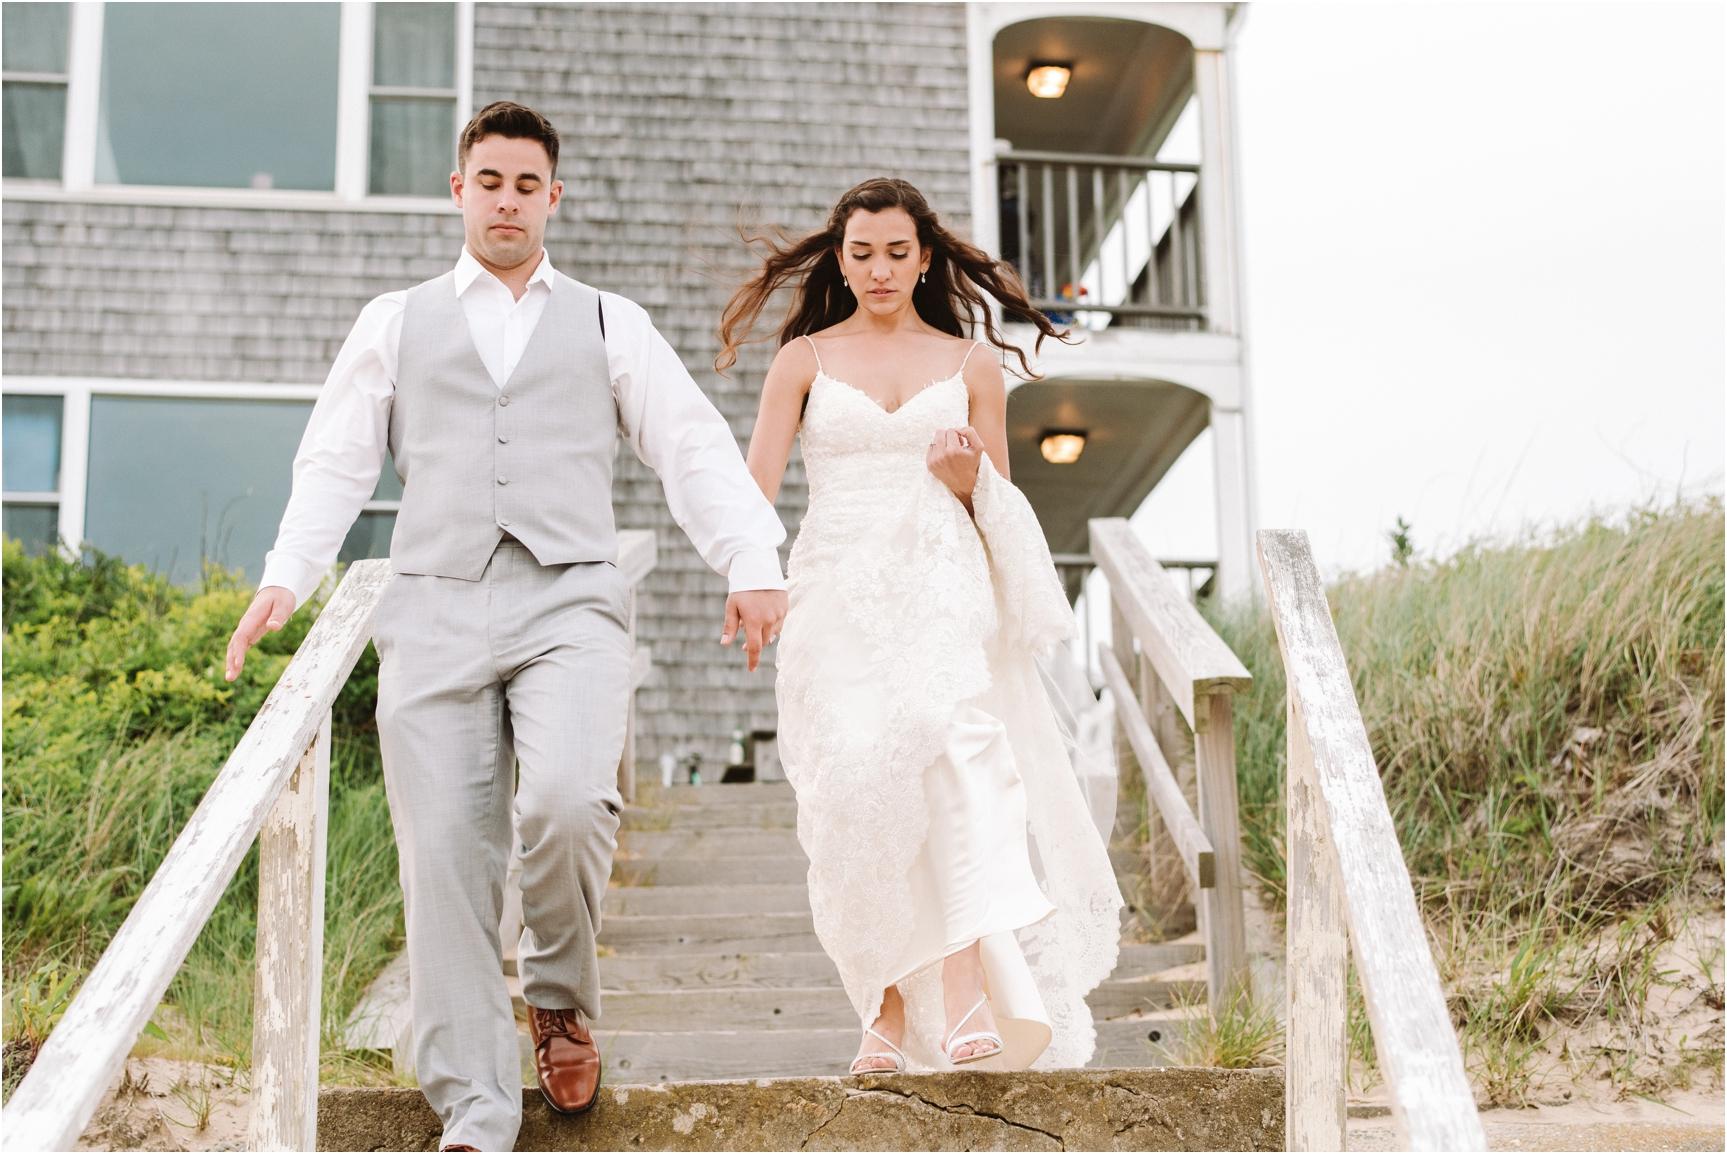 Sarah & Sam Pelham House Cape Cod Wedding Photographer-174.jpg